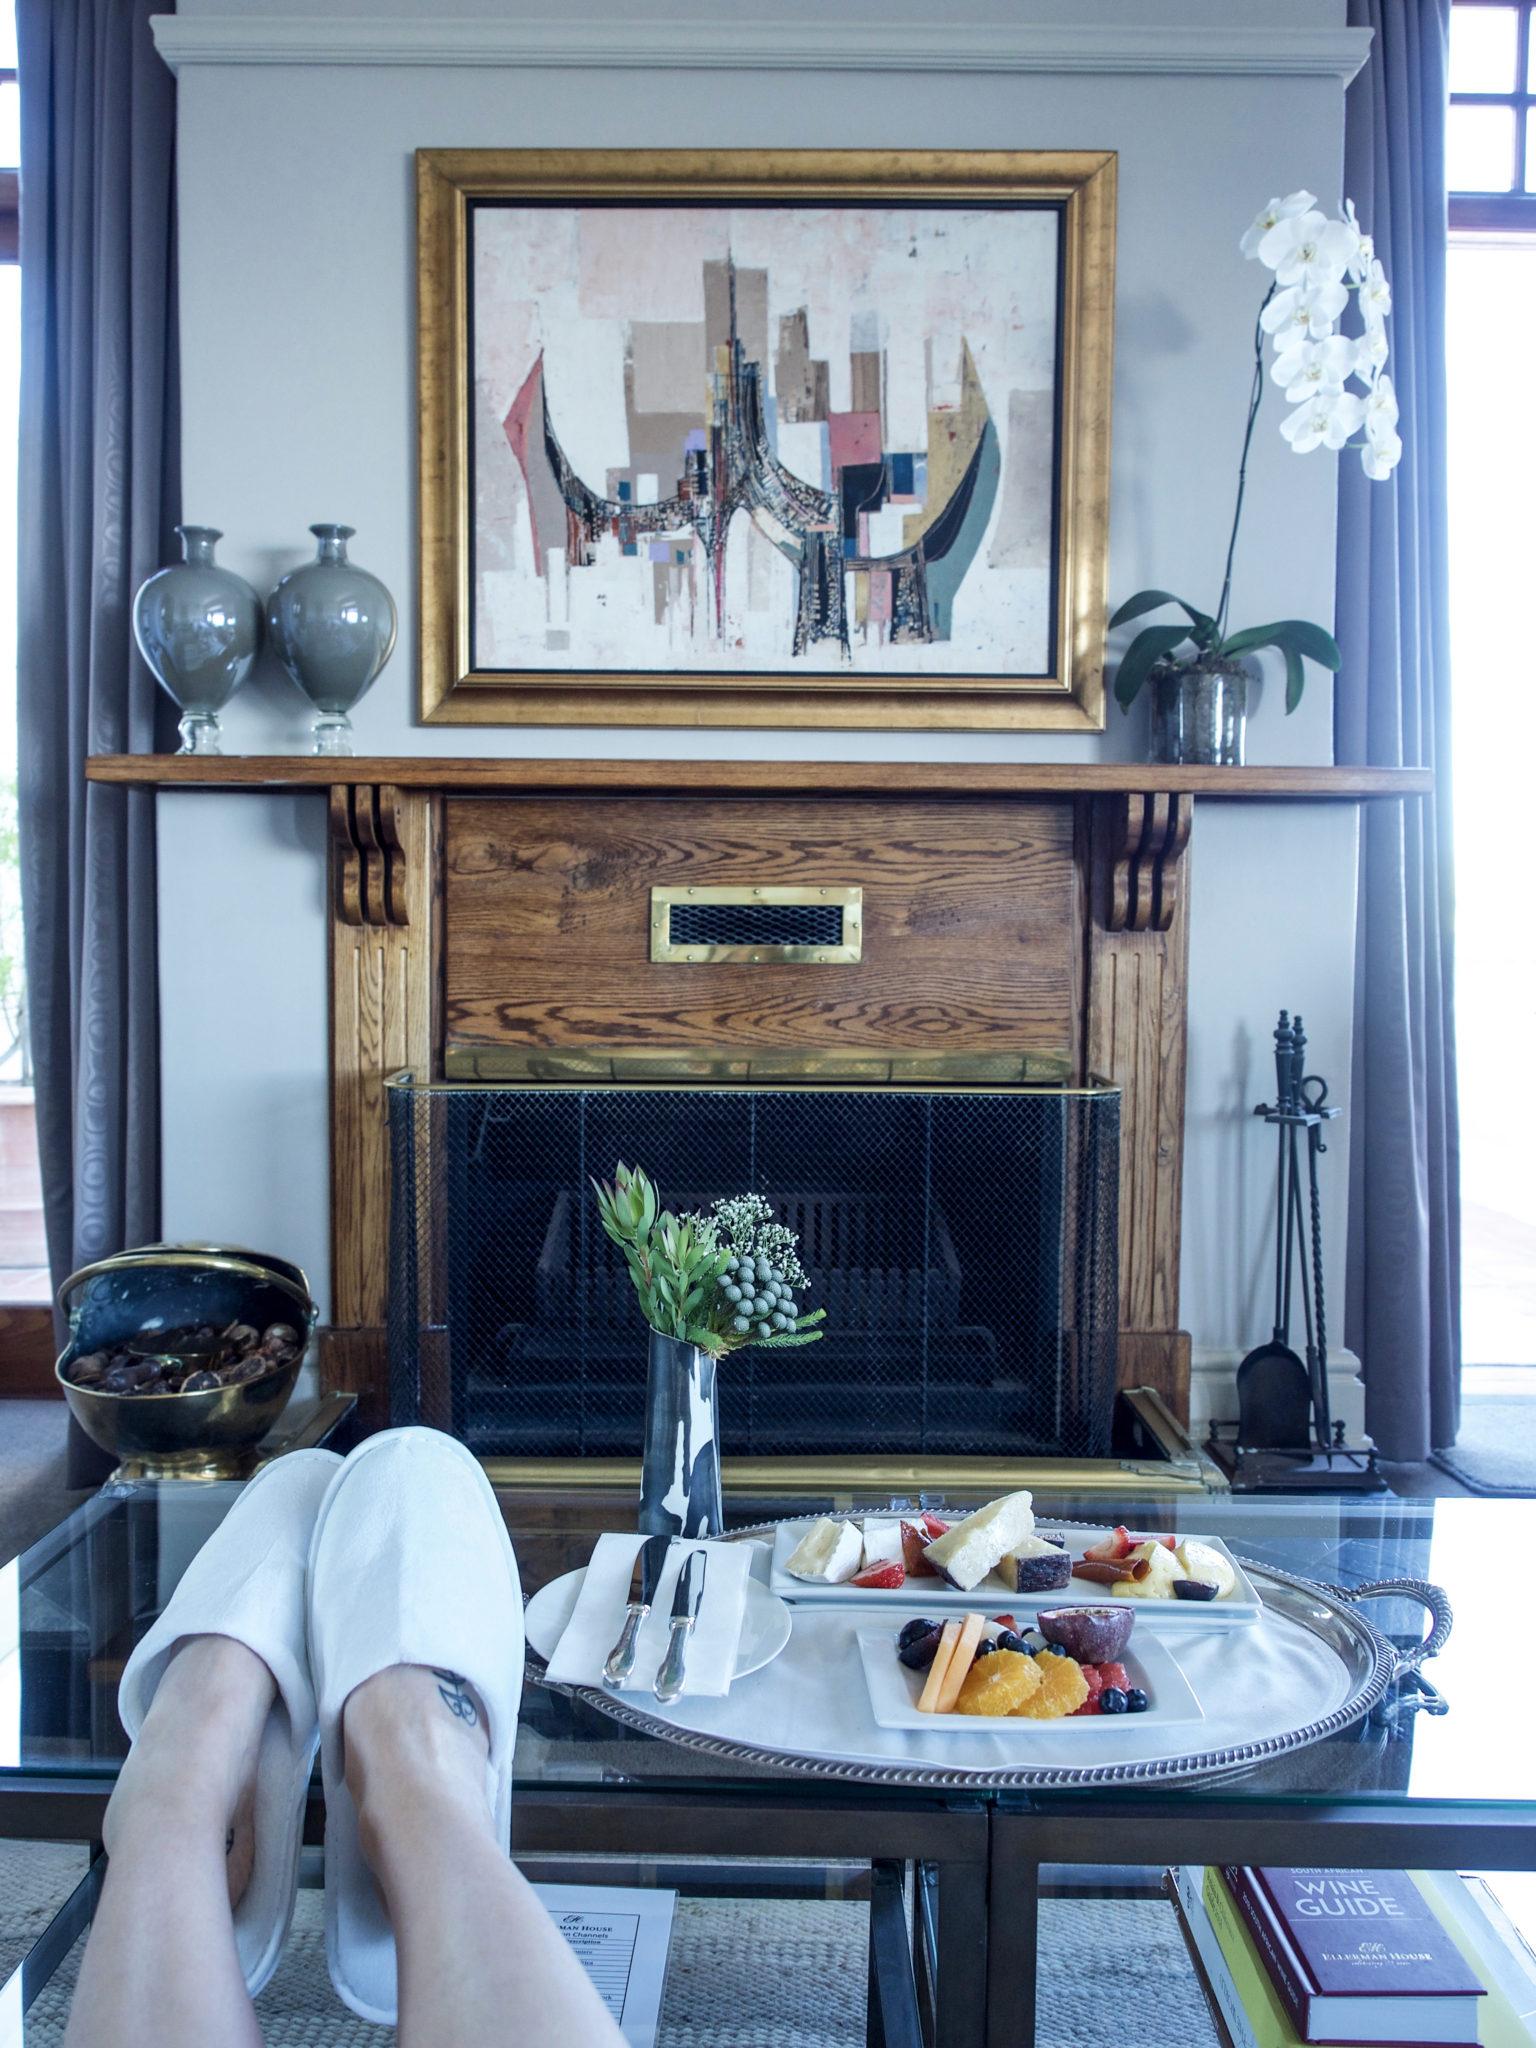 Ellerman House Cape Town | WORLD OF WANDERLUST